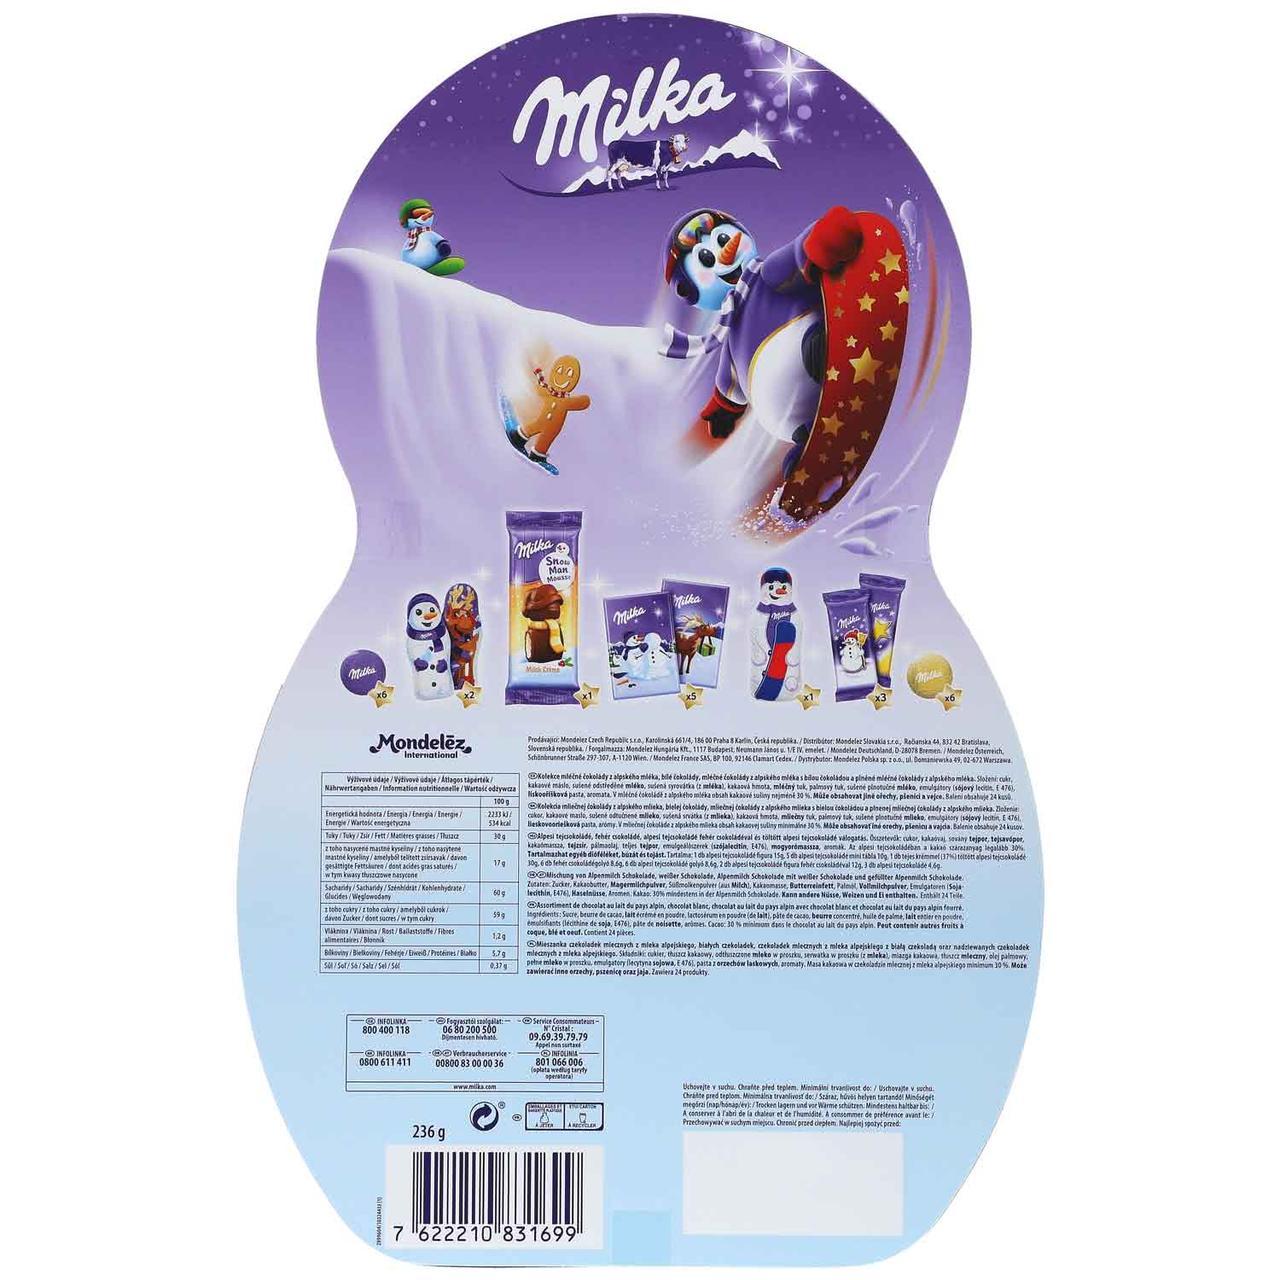 Milka Weihnachtskalender.Advent Kalendar Milka Snow Mix Adventskalender Veselyj Snegovik 235 Gramm